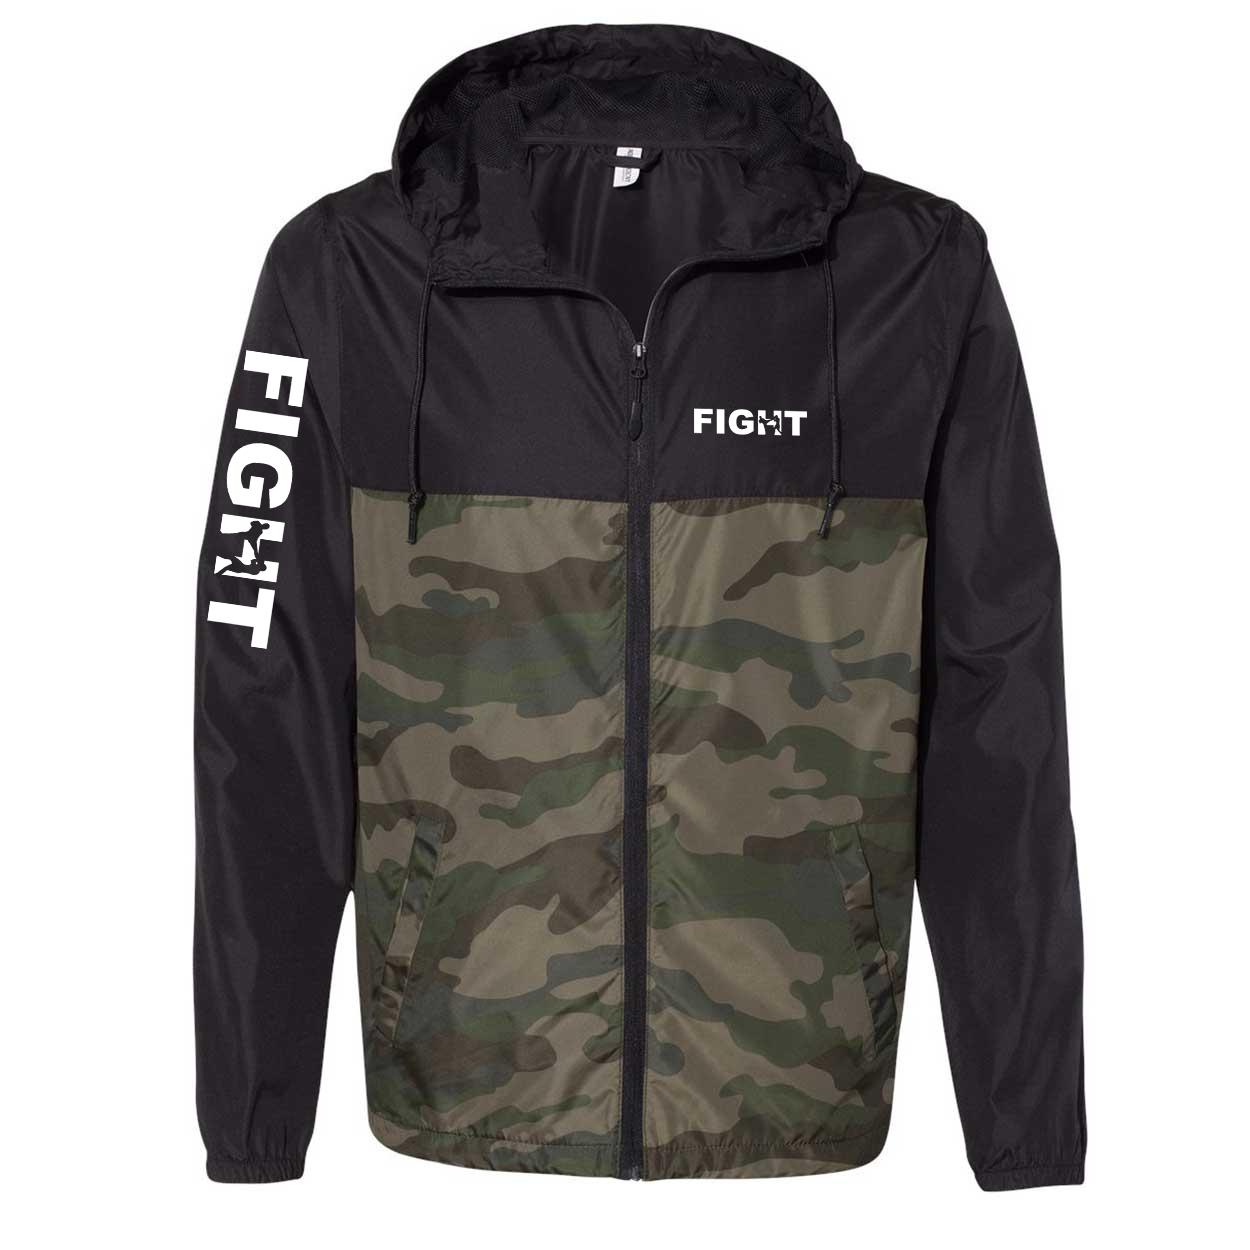 Fight Kick Logo Classic Lightweight Windbreaker Black/Forest Camo (White Logo)